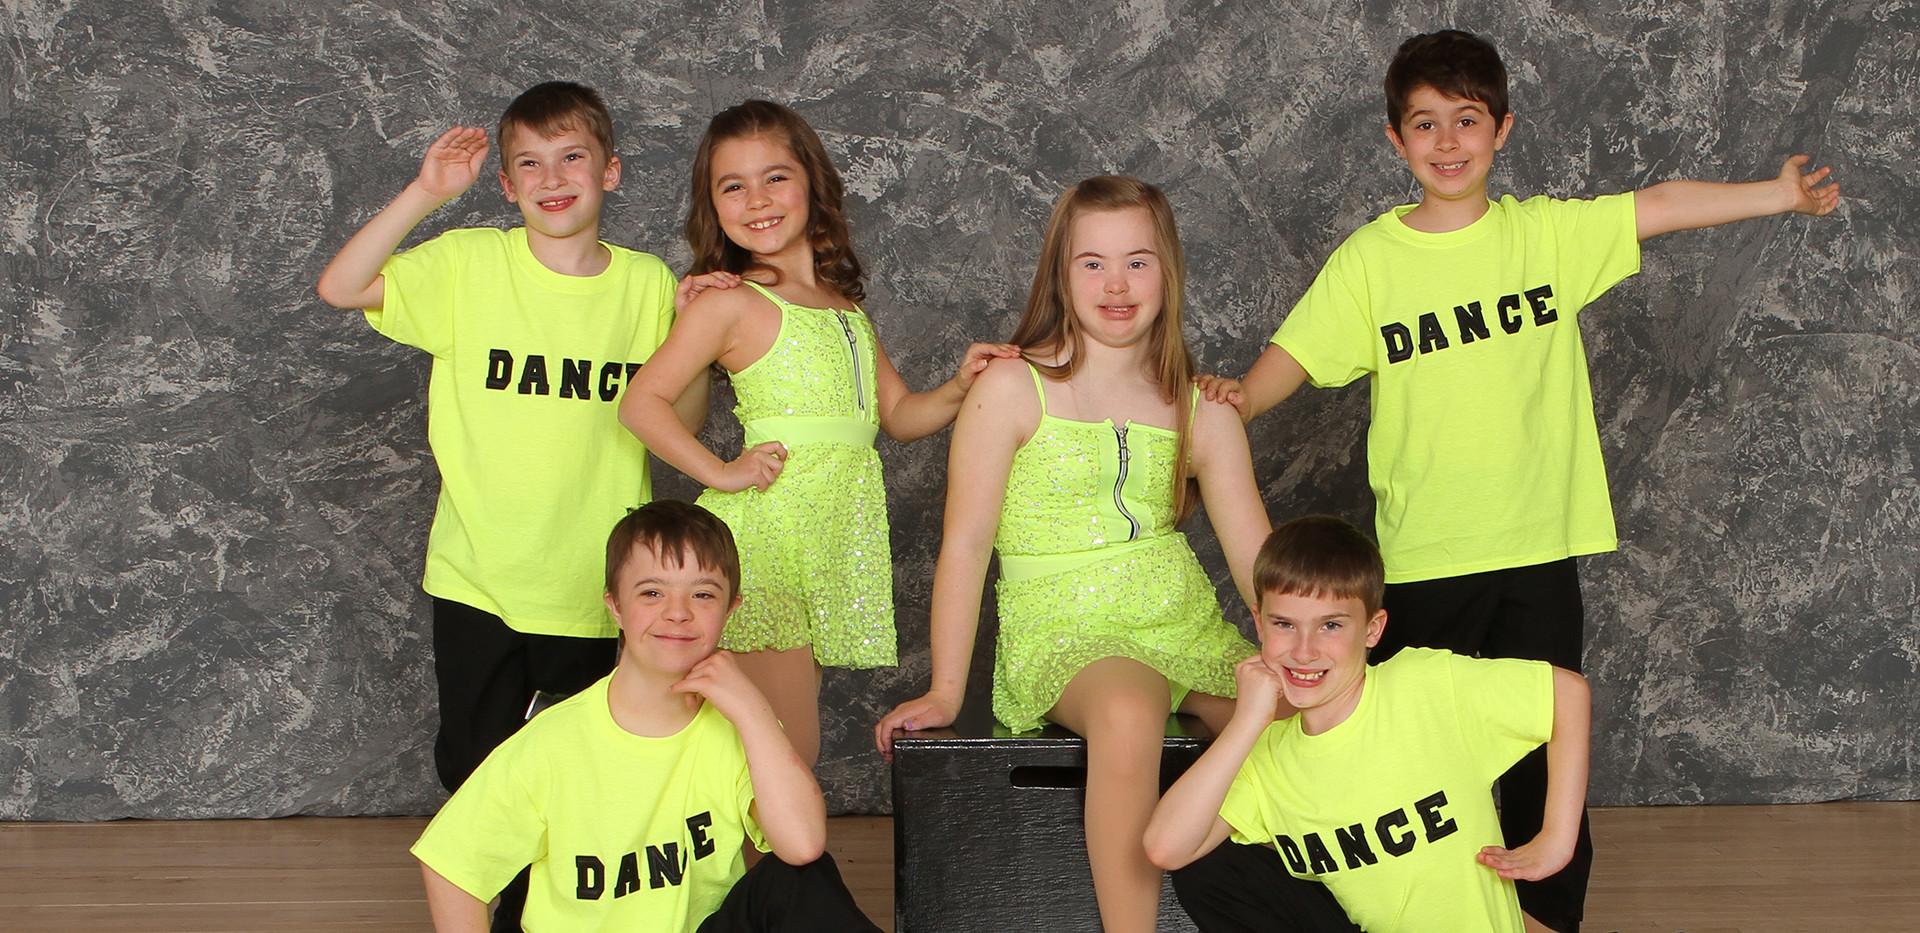 dance_dance_dance_9495.JPG